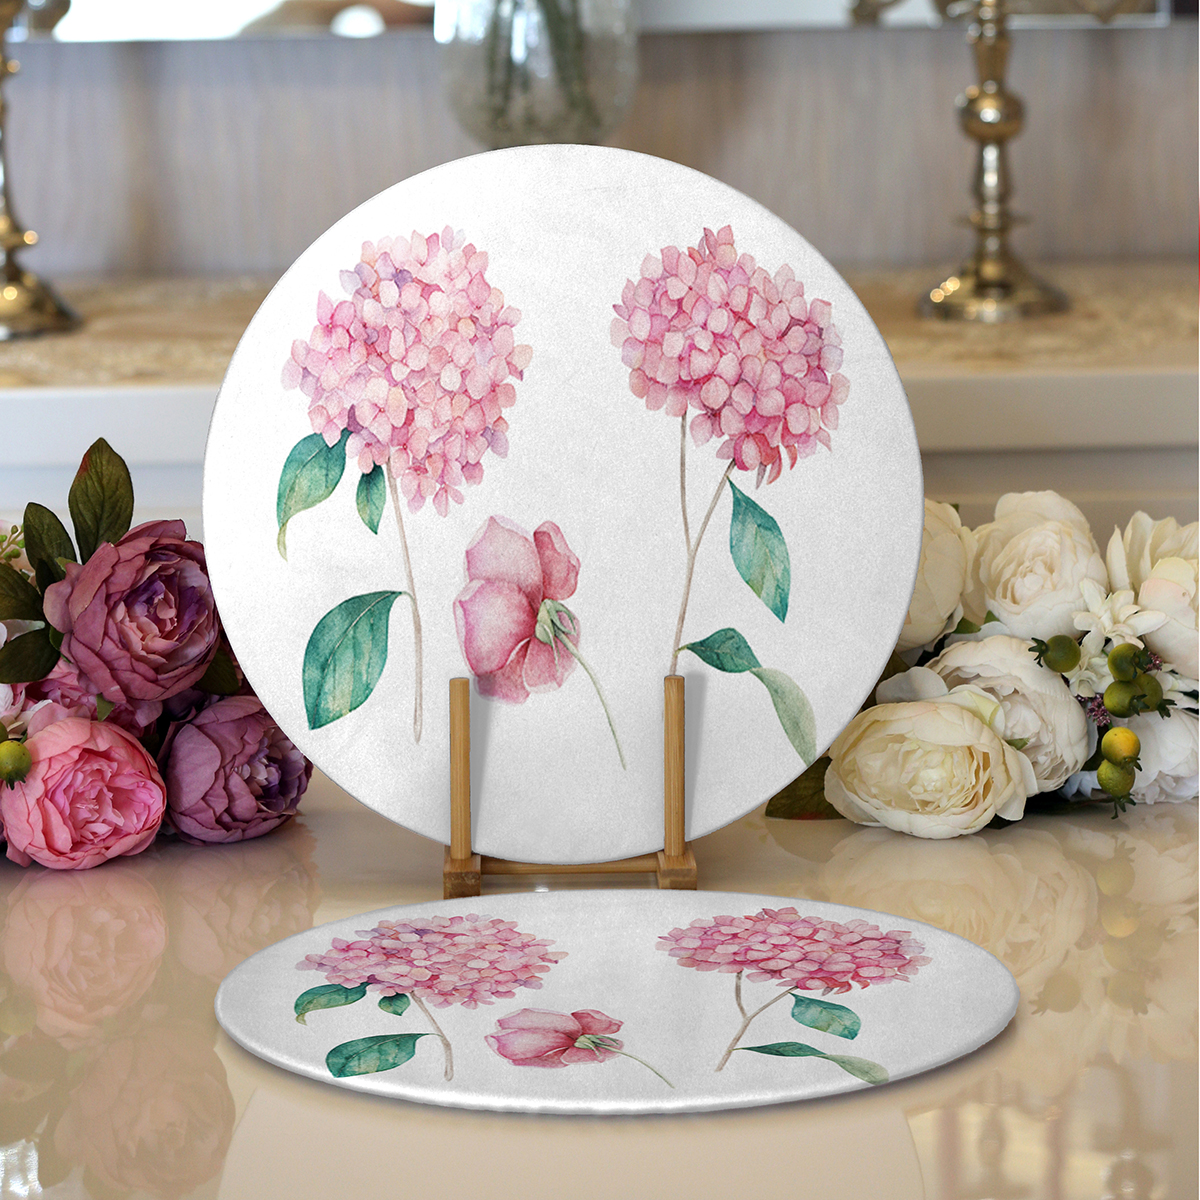 Realhomes Beyaz Zeminli Renkli Ortanca Çiçek Motifli Dijital Baskılı Modern 2'li Yuvarlak Servis Altlığı - Supla Realhomes